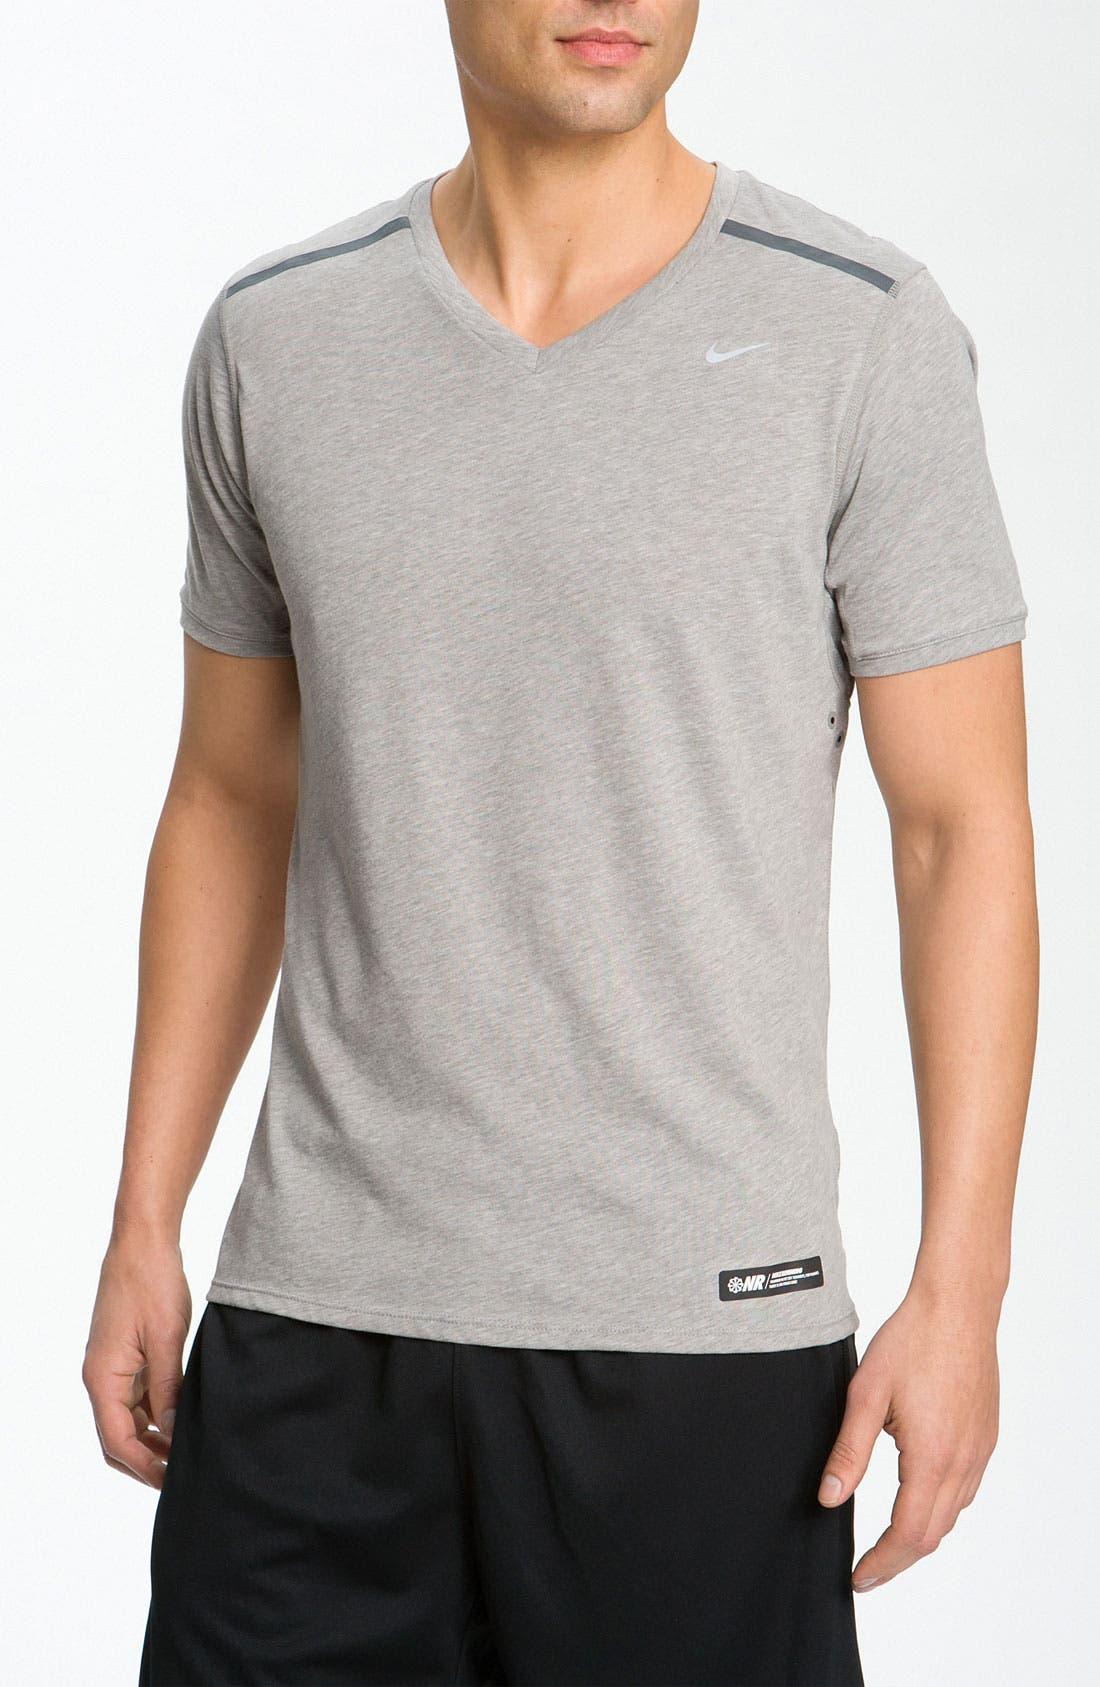 Main Image - Nike 'Tailwind' T-Shirt